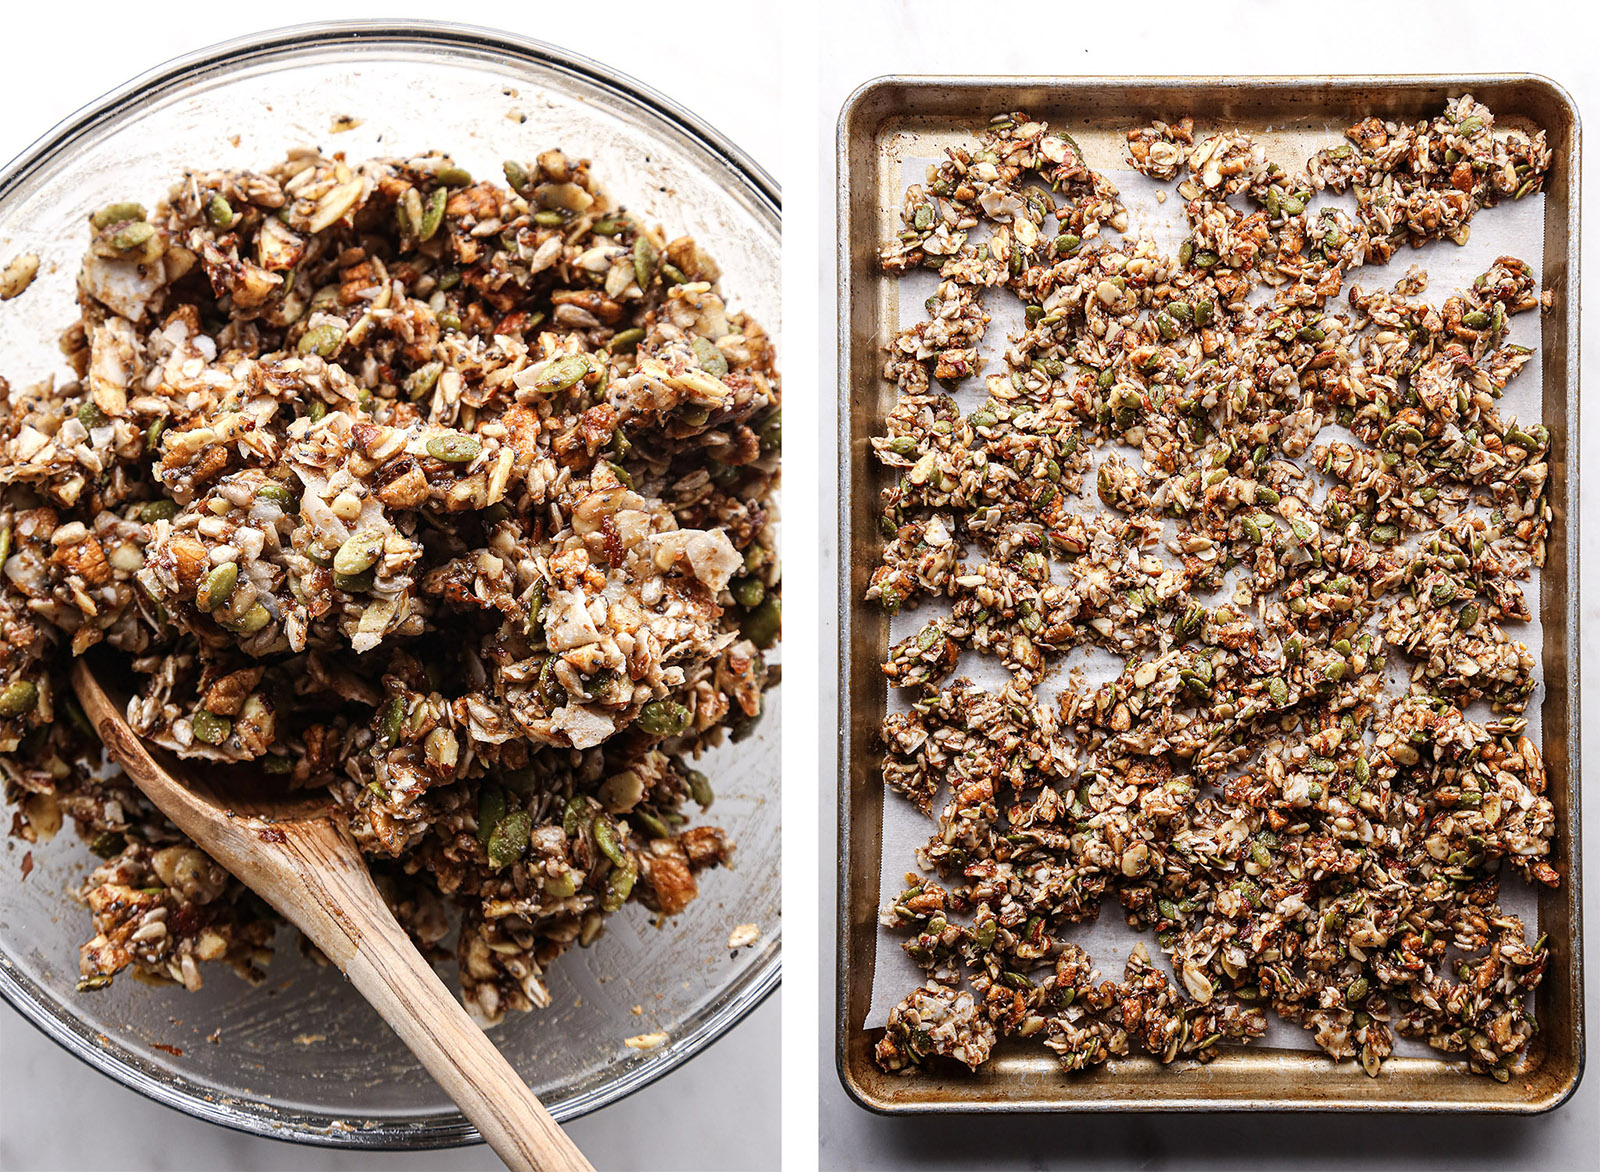 Fruit-Sweetened Grain-Free Granola | Vegan plus free of grains, gluten, dairy, and refined sugar